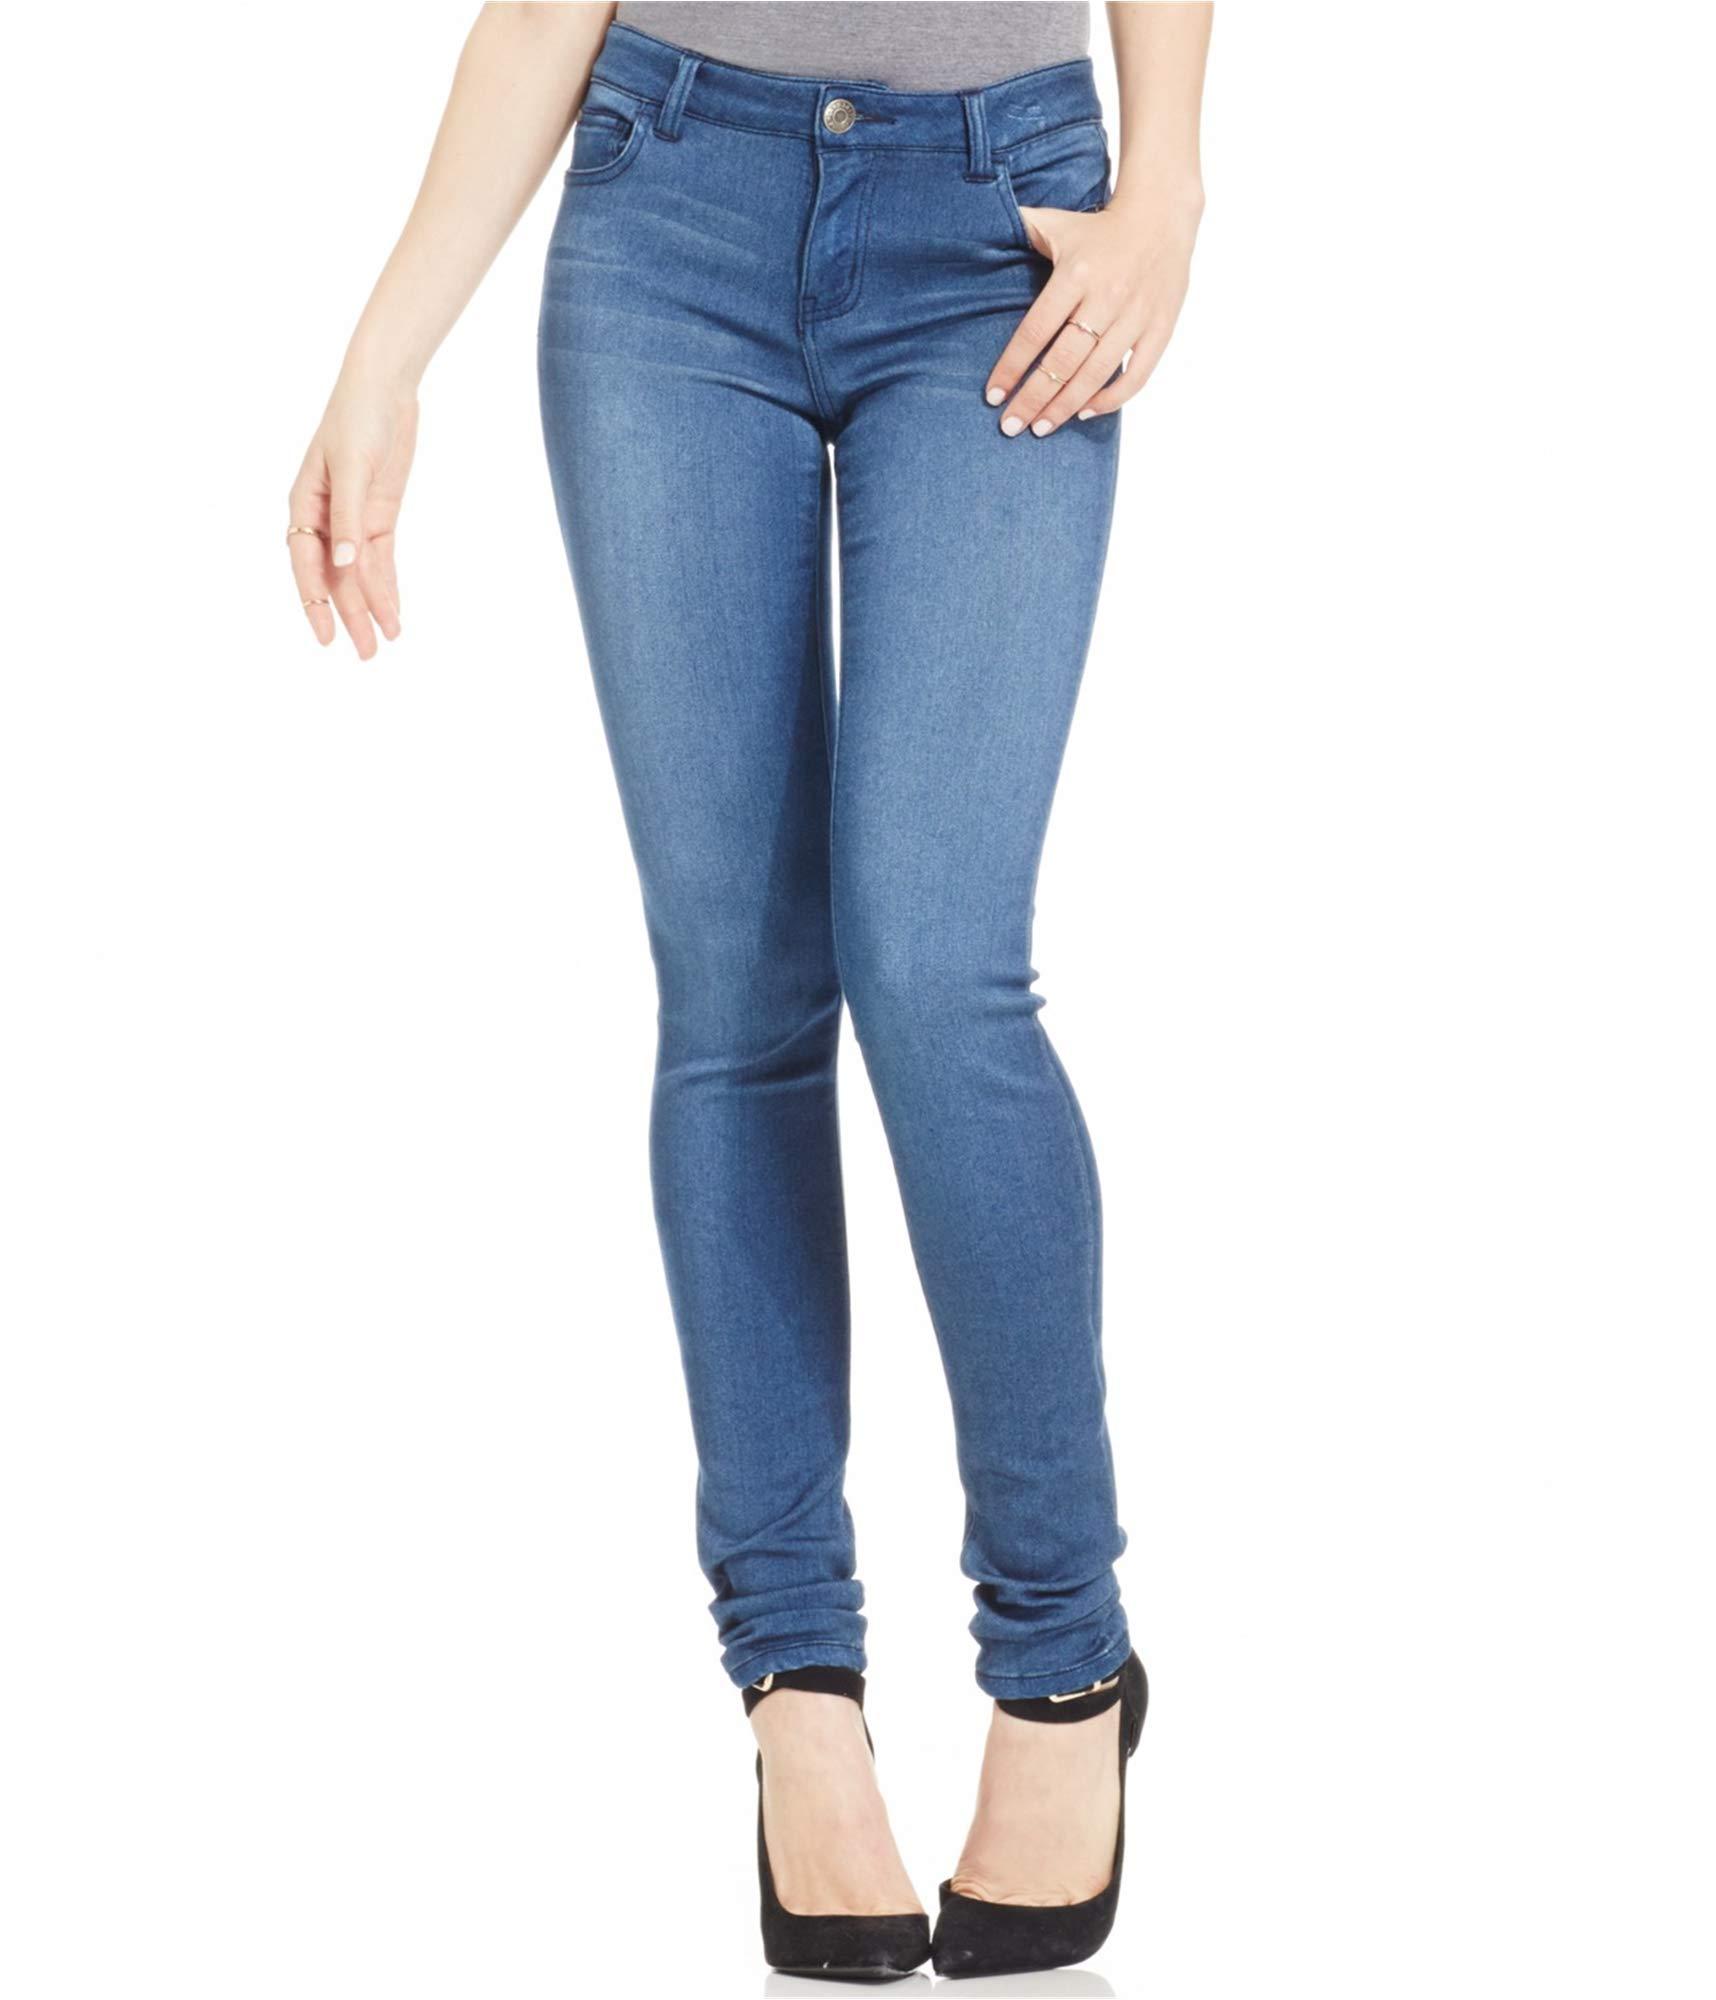 5a0b229ca76b95 Celebrity Pink Jeans Women's Super Soft Mid Rise Skinny Jean - Denim Fit